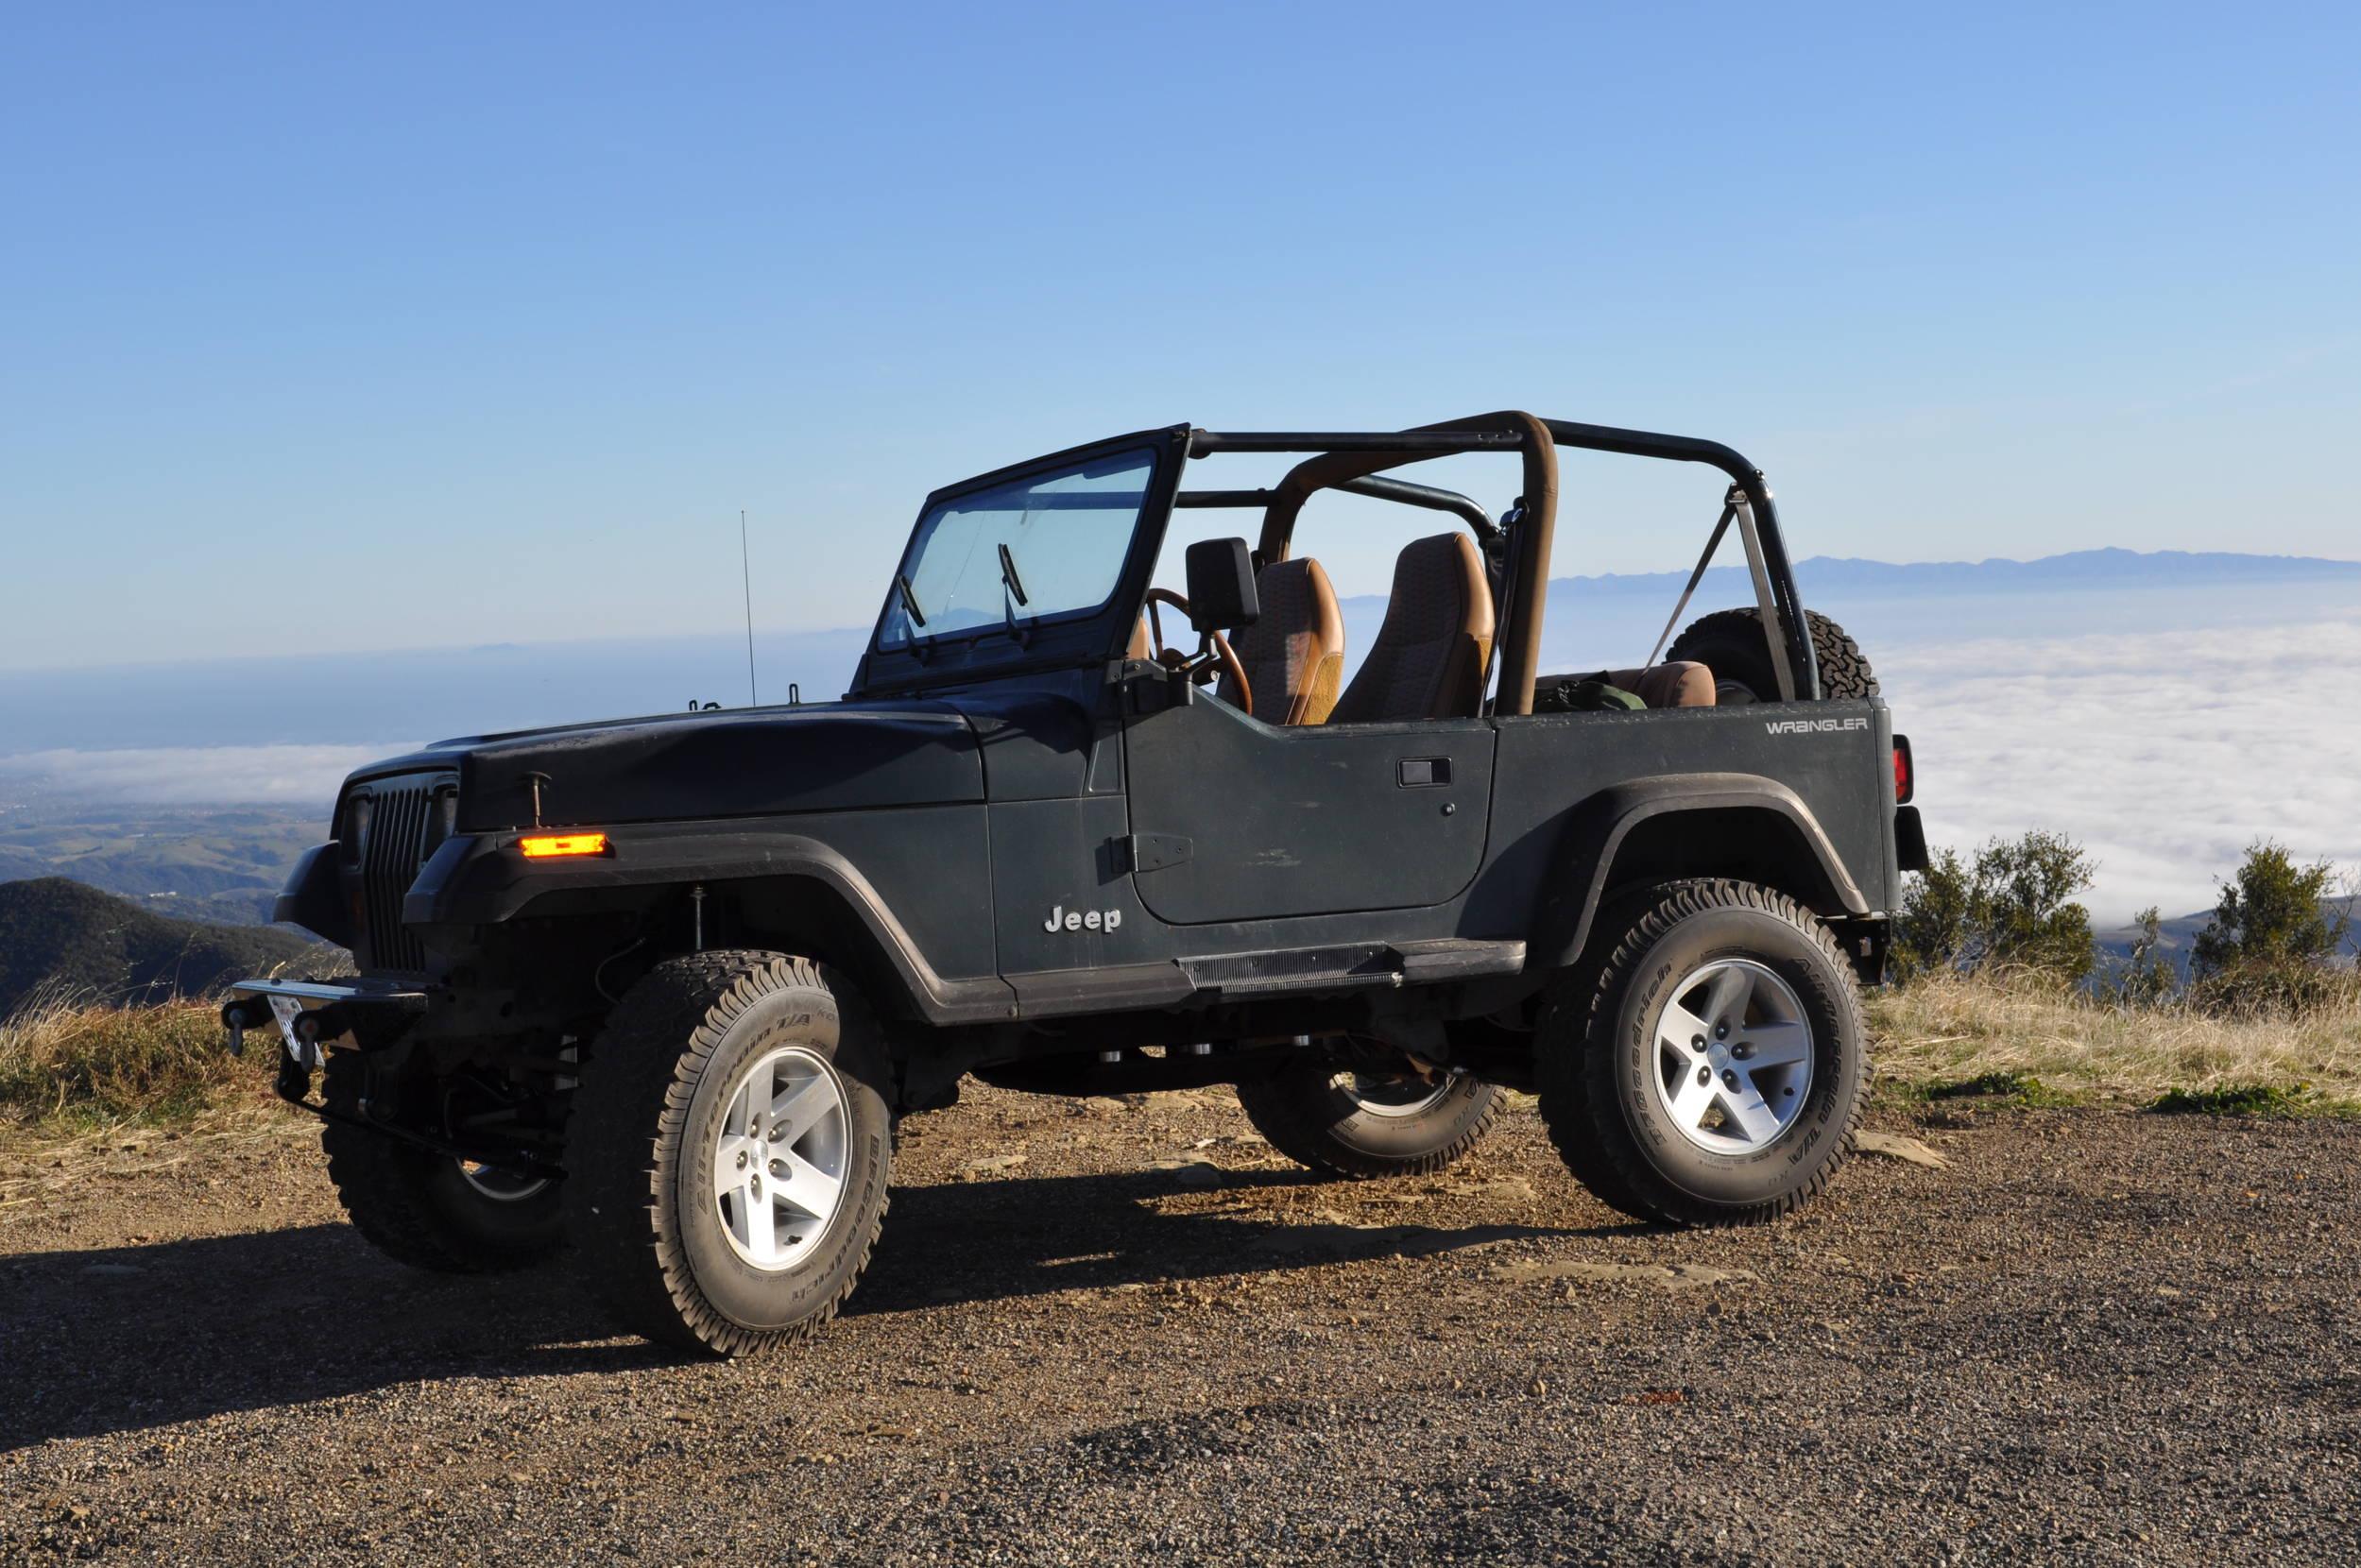 1-1-12_jeep.JPG